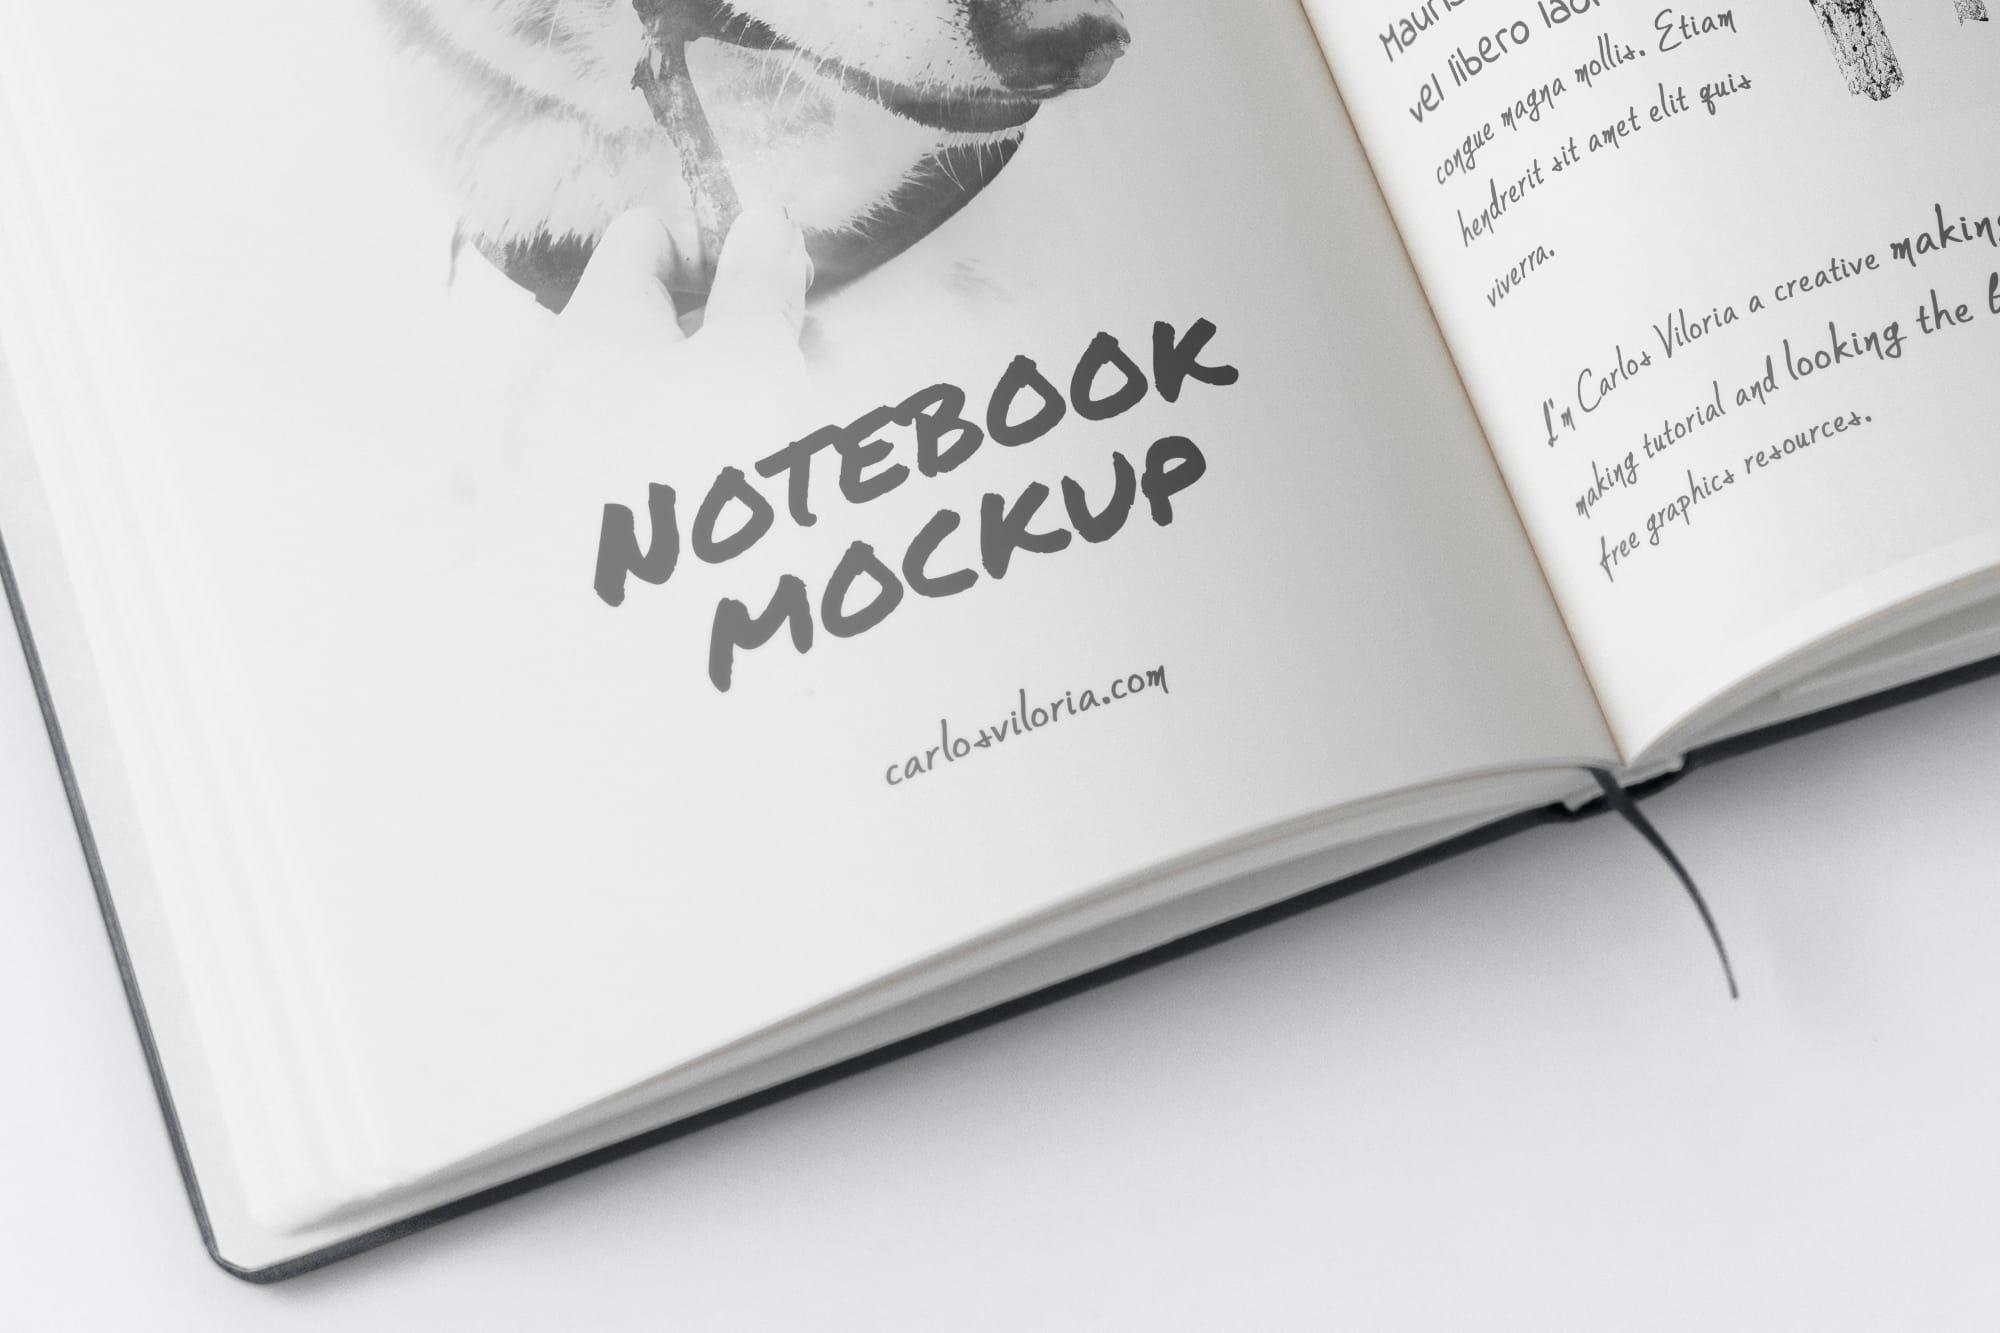 Free A5 Sketch Notebook Mockup 02 for Photoshop - Carlos Viloria